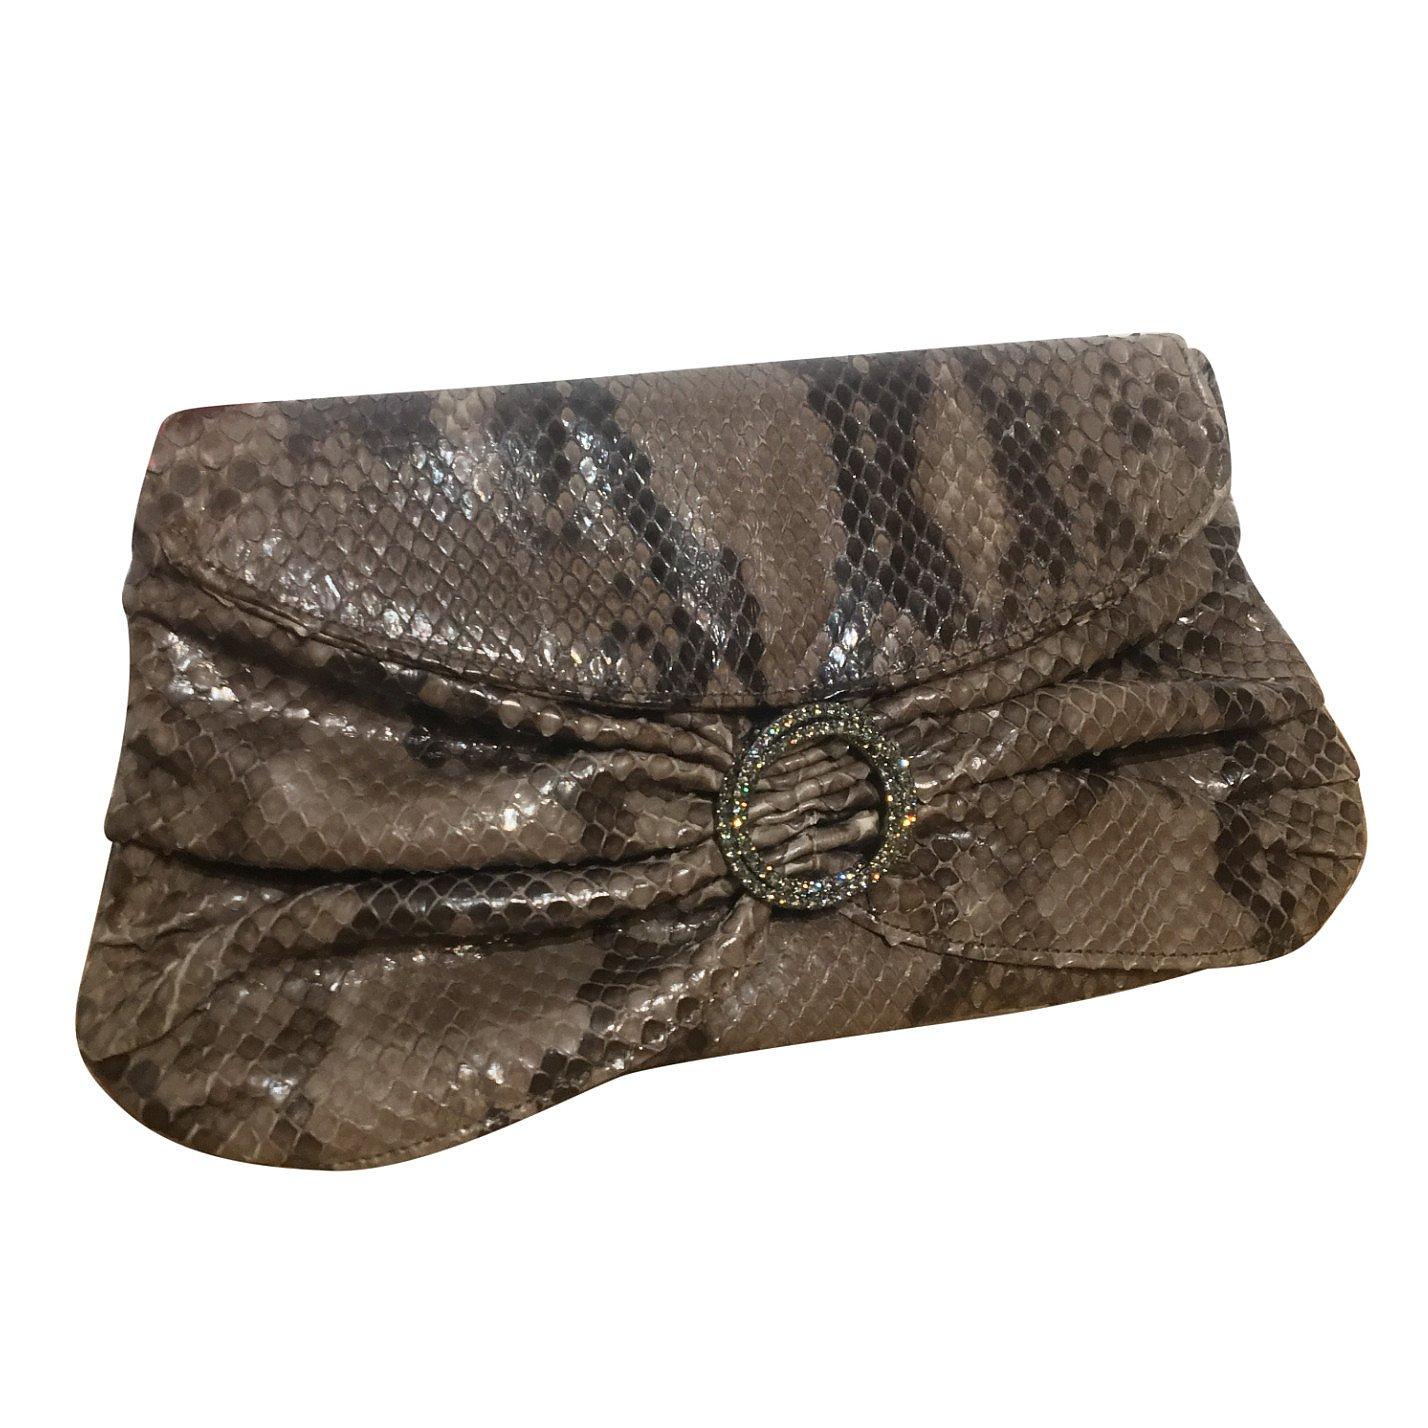 Anya Hindmarch Snakeskin Jewel Clutch